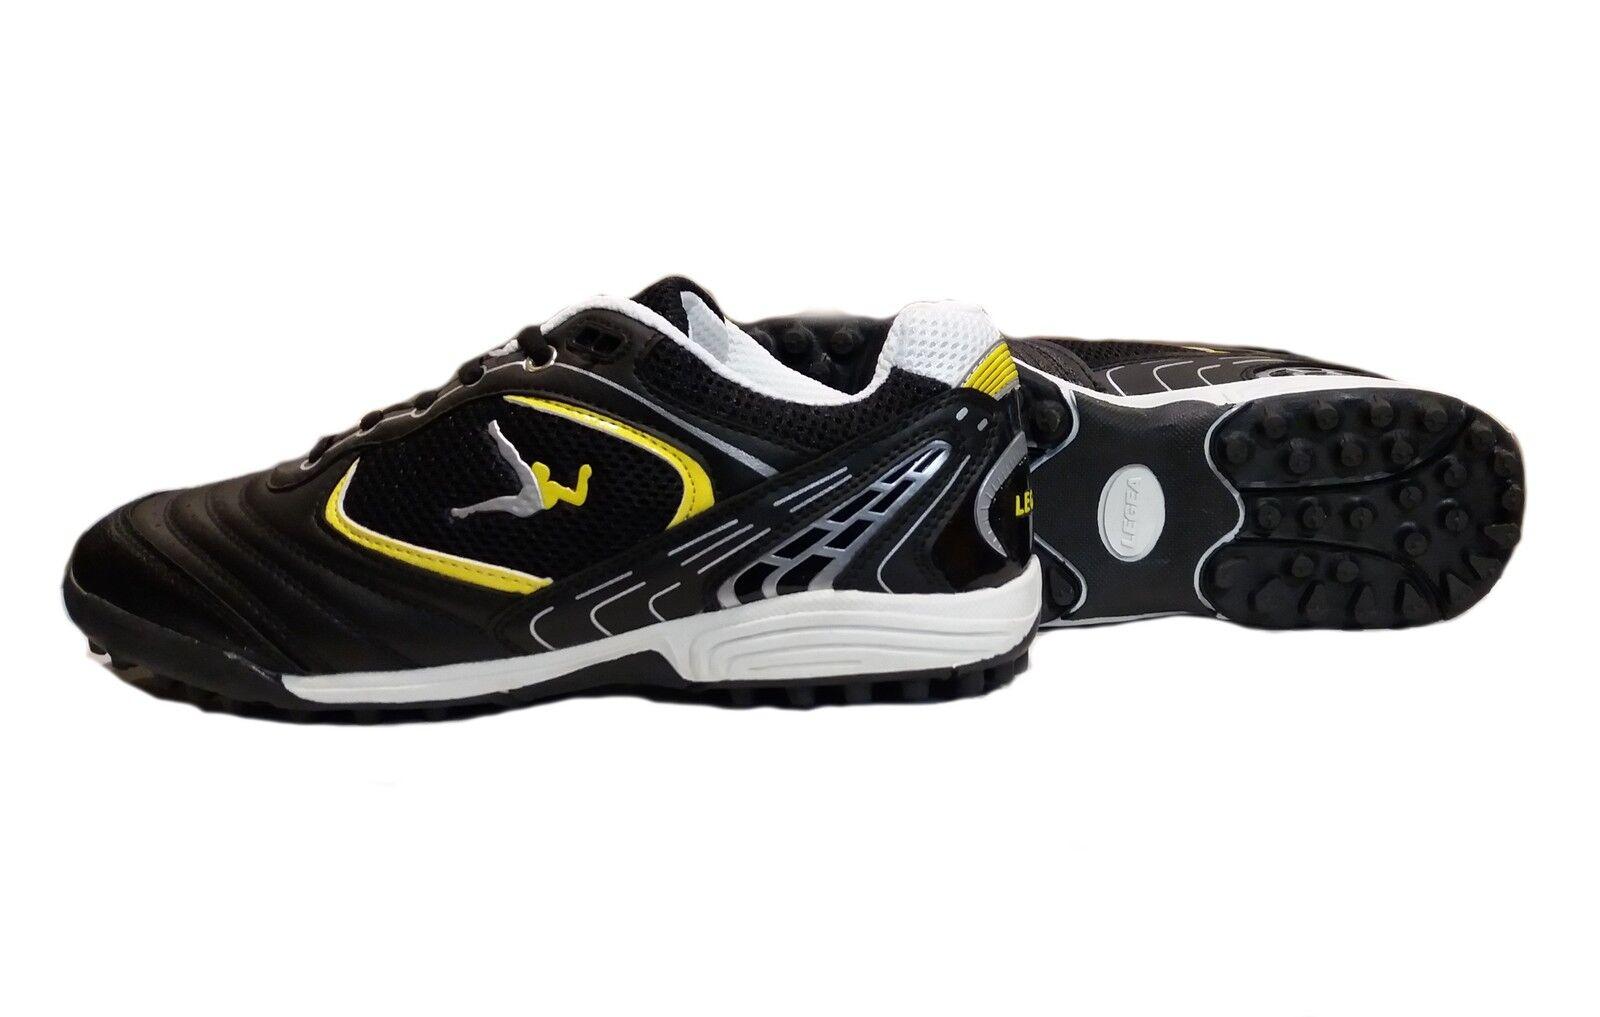 Legea Futsalschuhe Boras Outdoor Outdoor Outdoor Junior schwarze Farbe gelb Artikel SA551 JR 1071d6